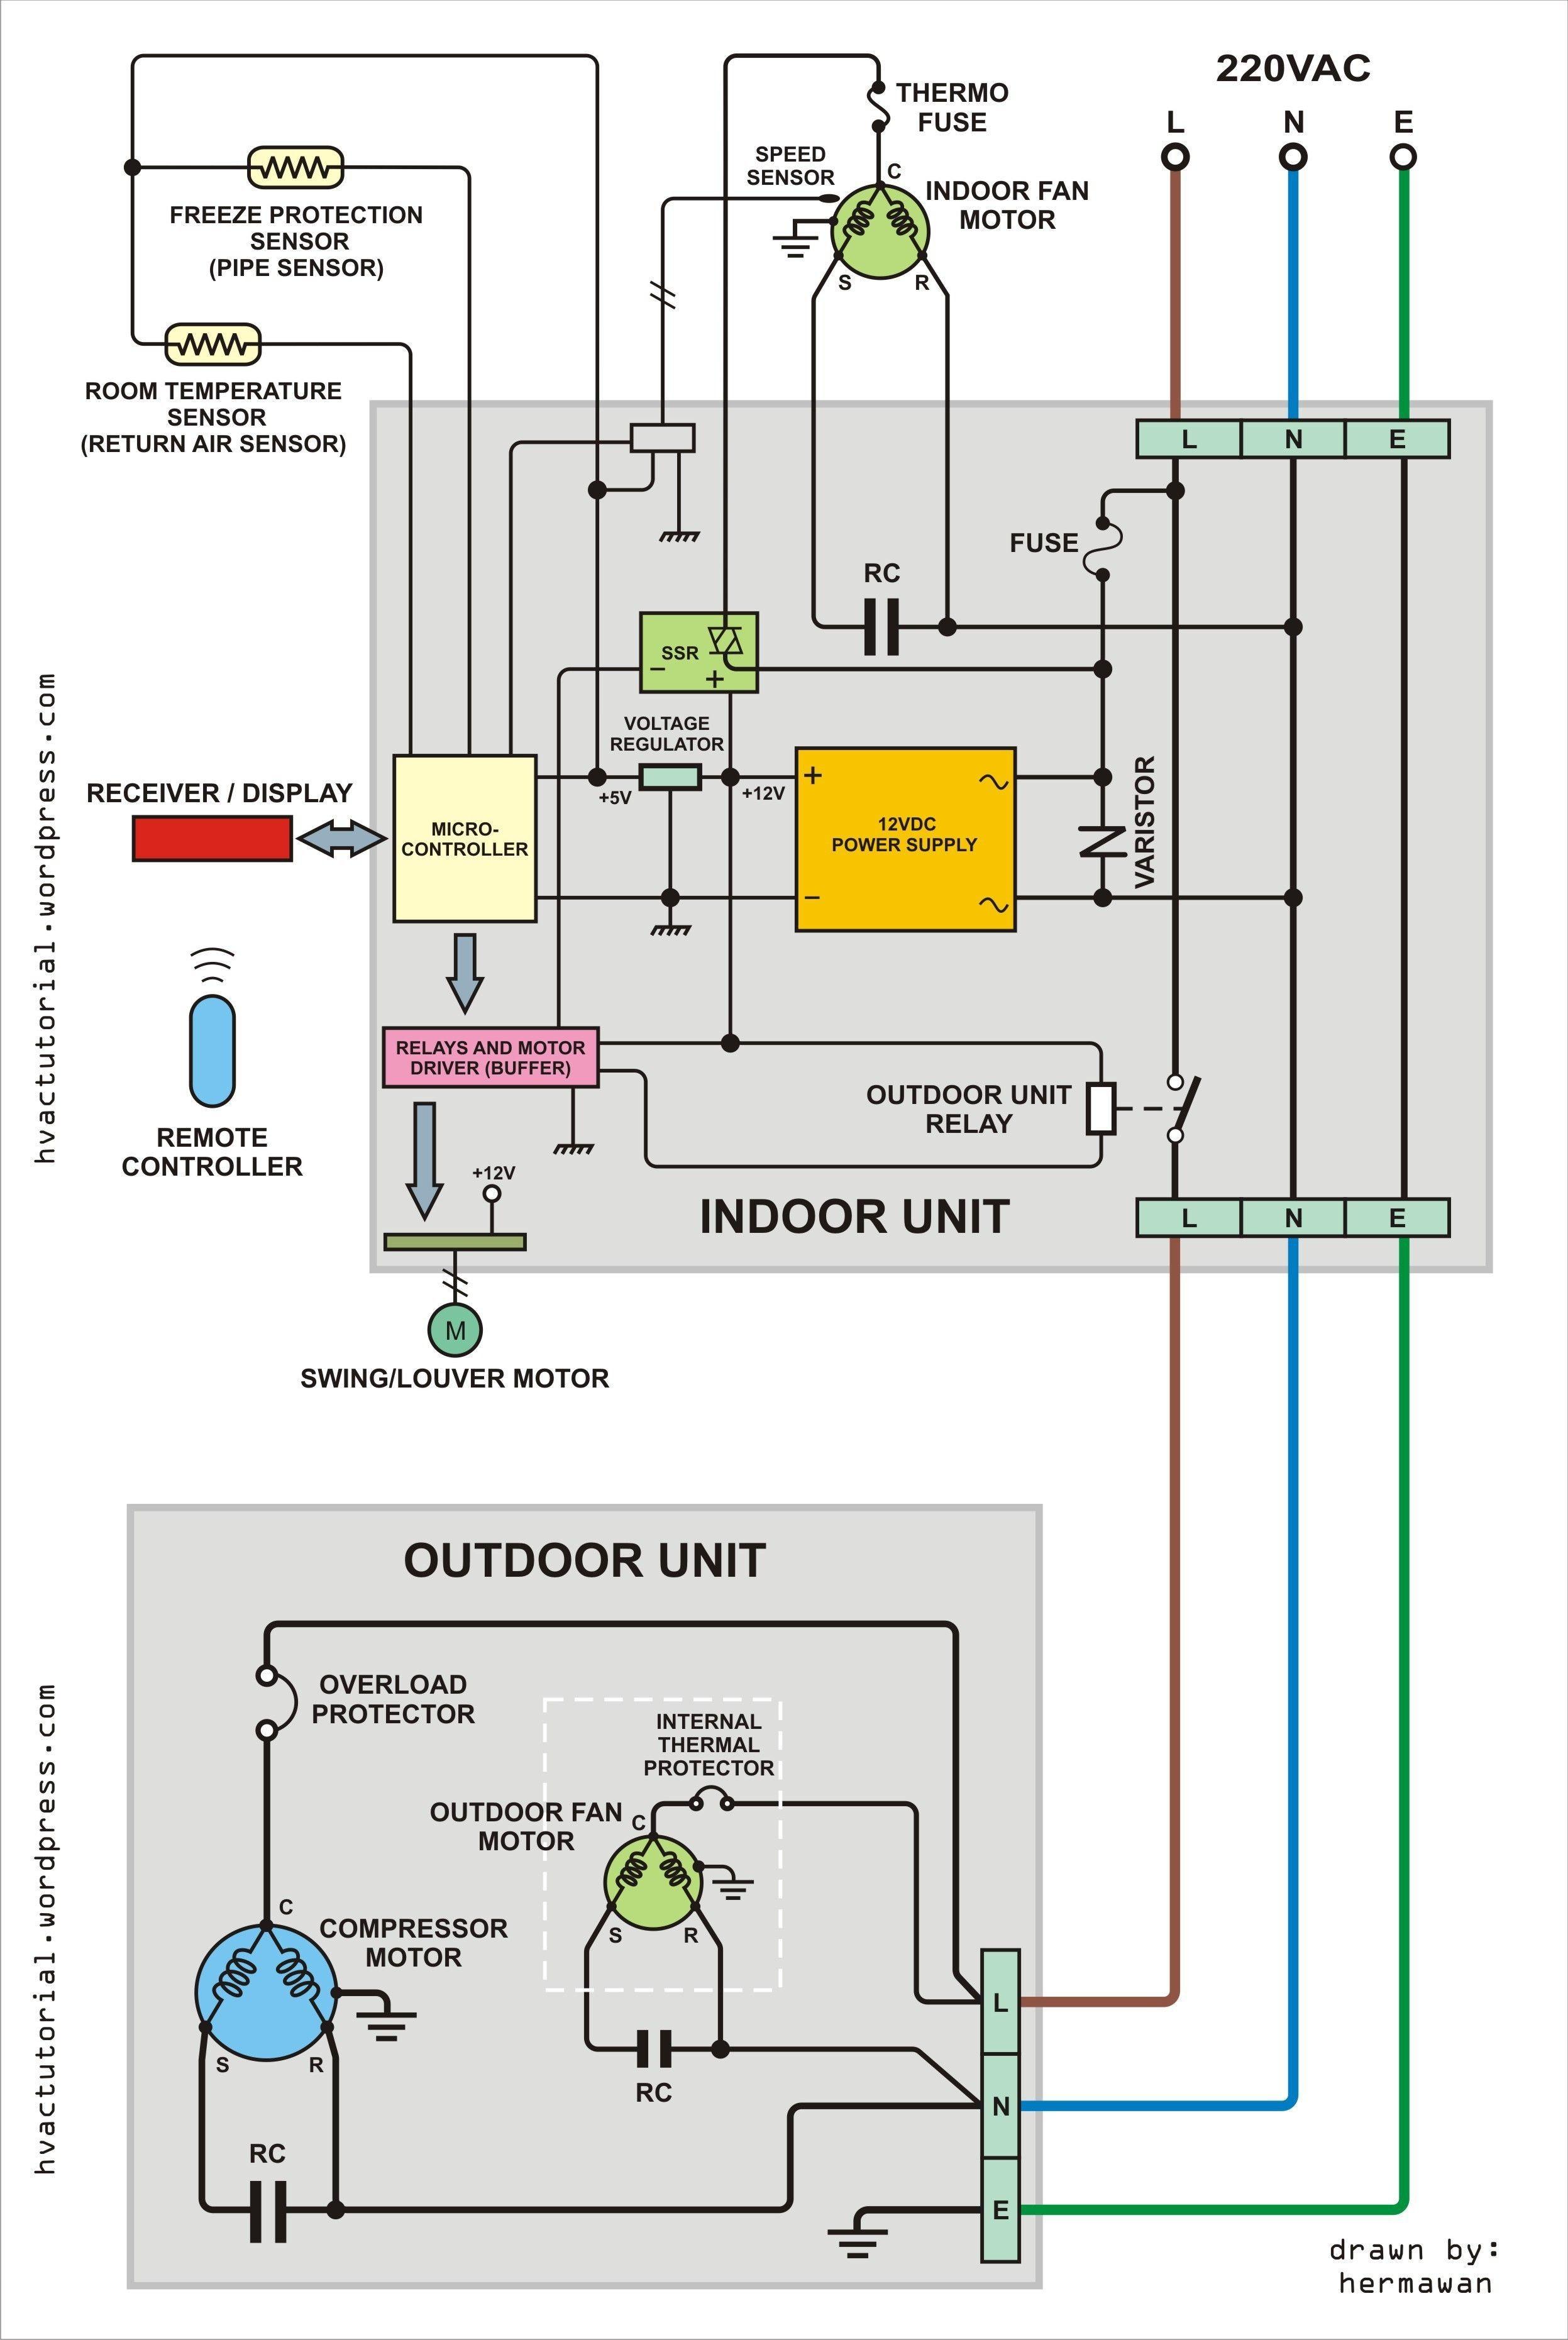 Diagram Of Auto Ac System Shocking Wiring Diagram Carrier Air Conditioner New Split Ac Csr Of Diagram Of Auto Ac System